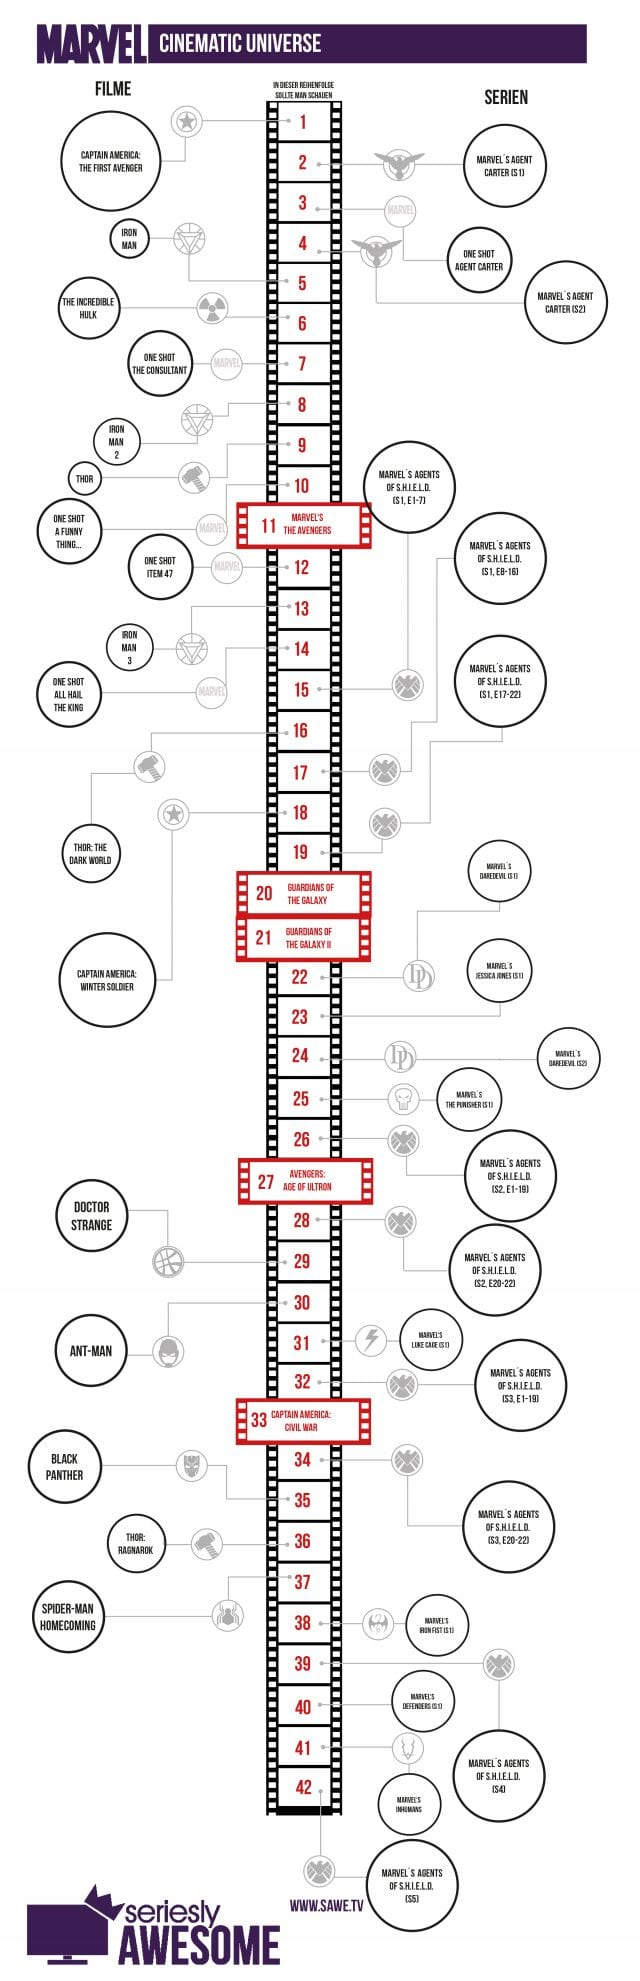 Mcu Chronologische Reihenfolge